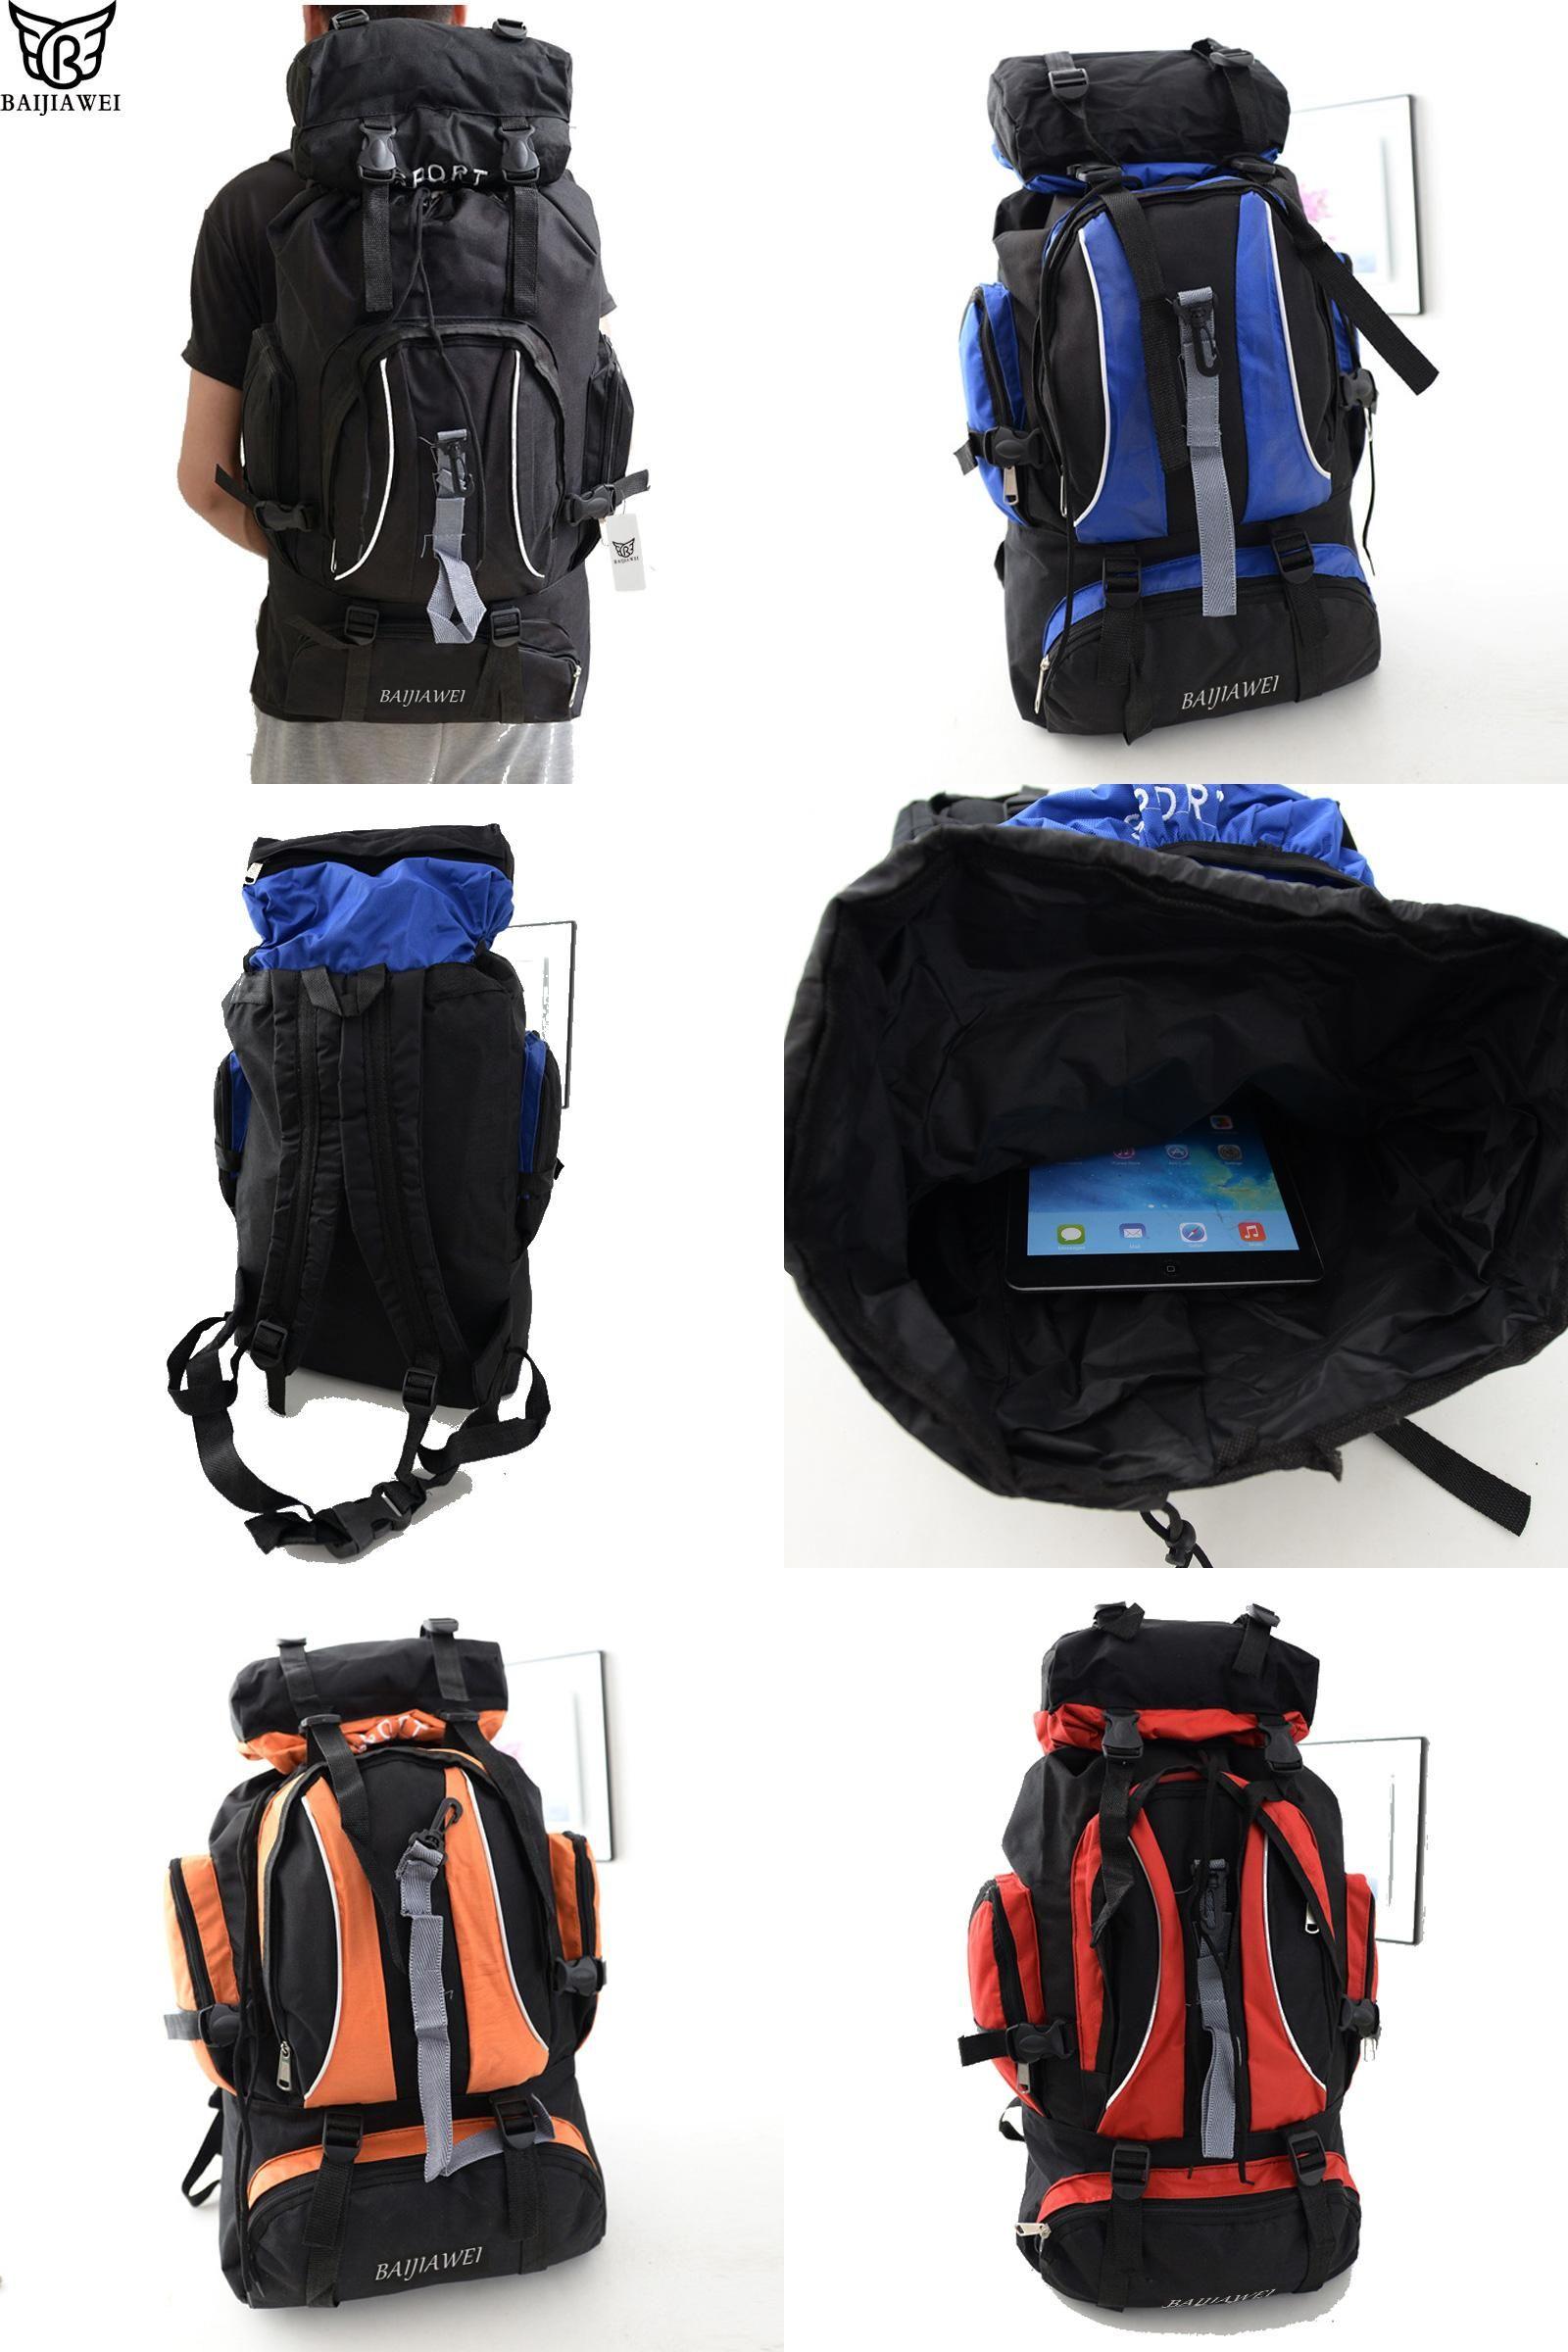 Visit to Buy] BAIJIAWEI 60 Liters Large Capacity Multifunction Travel  Backpacks For Man and Women Trekkin… | Mens backpack travel, Trekking  rucksack, Foldable bag